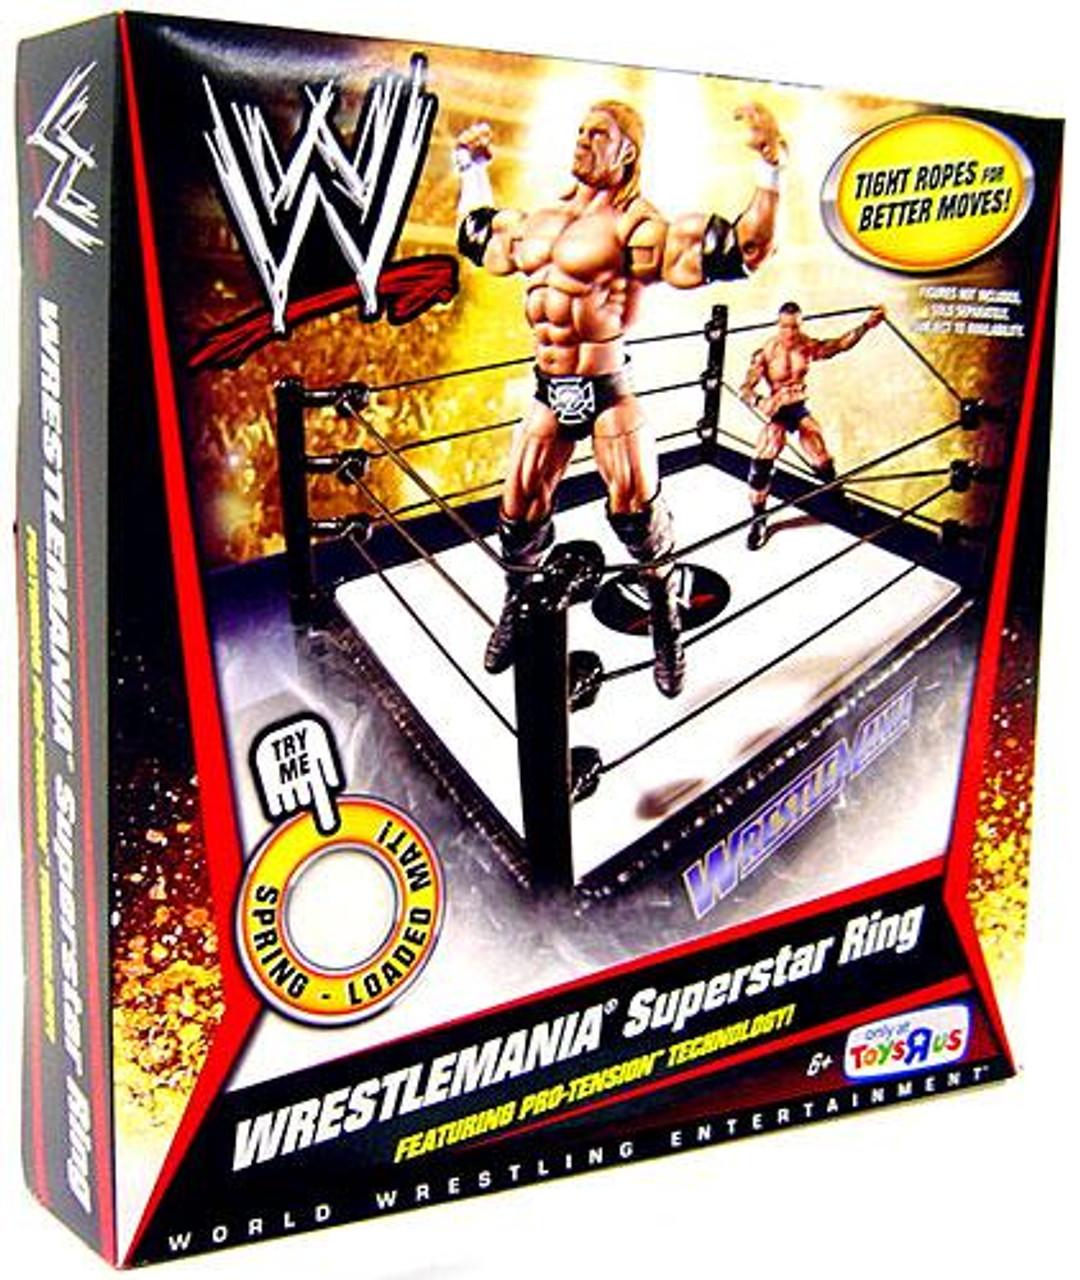 WWE Wrestling Wrestlemania Exclusive Superstar Ring